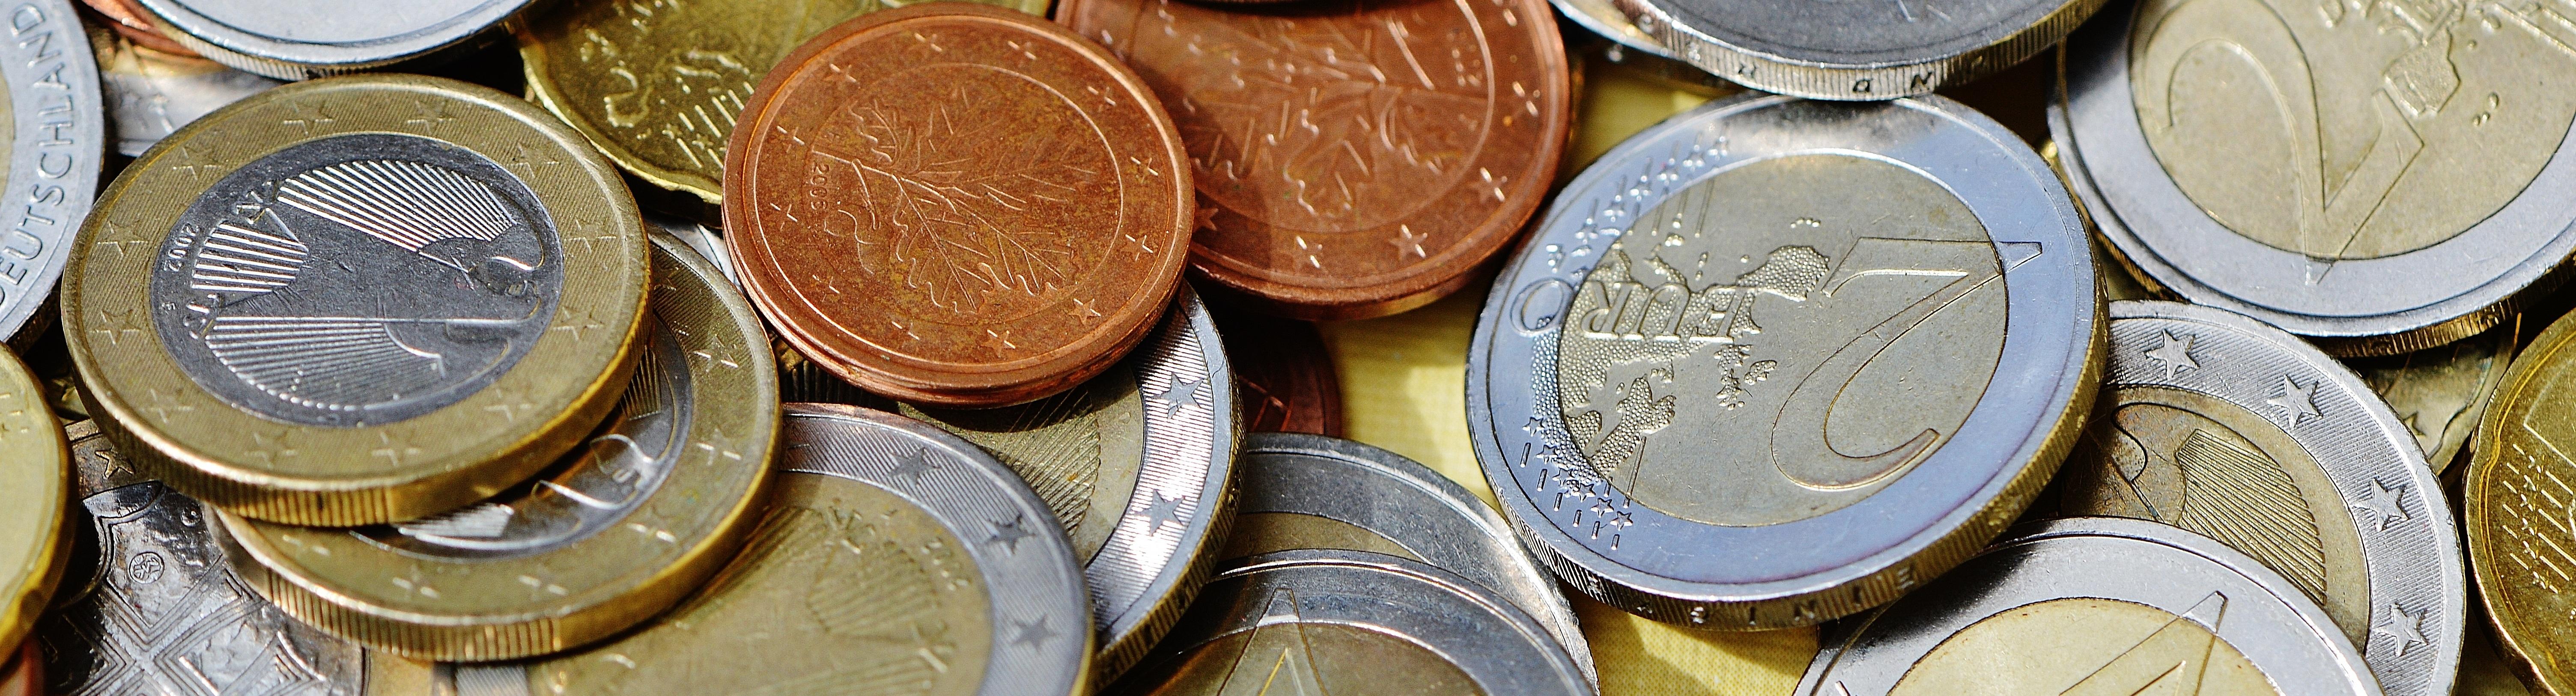 money euro eurozone budget european parliament lubor lacina bernd lucke debate